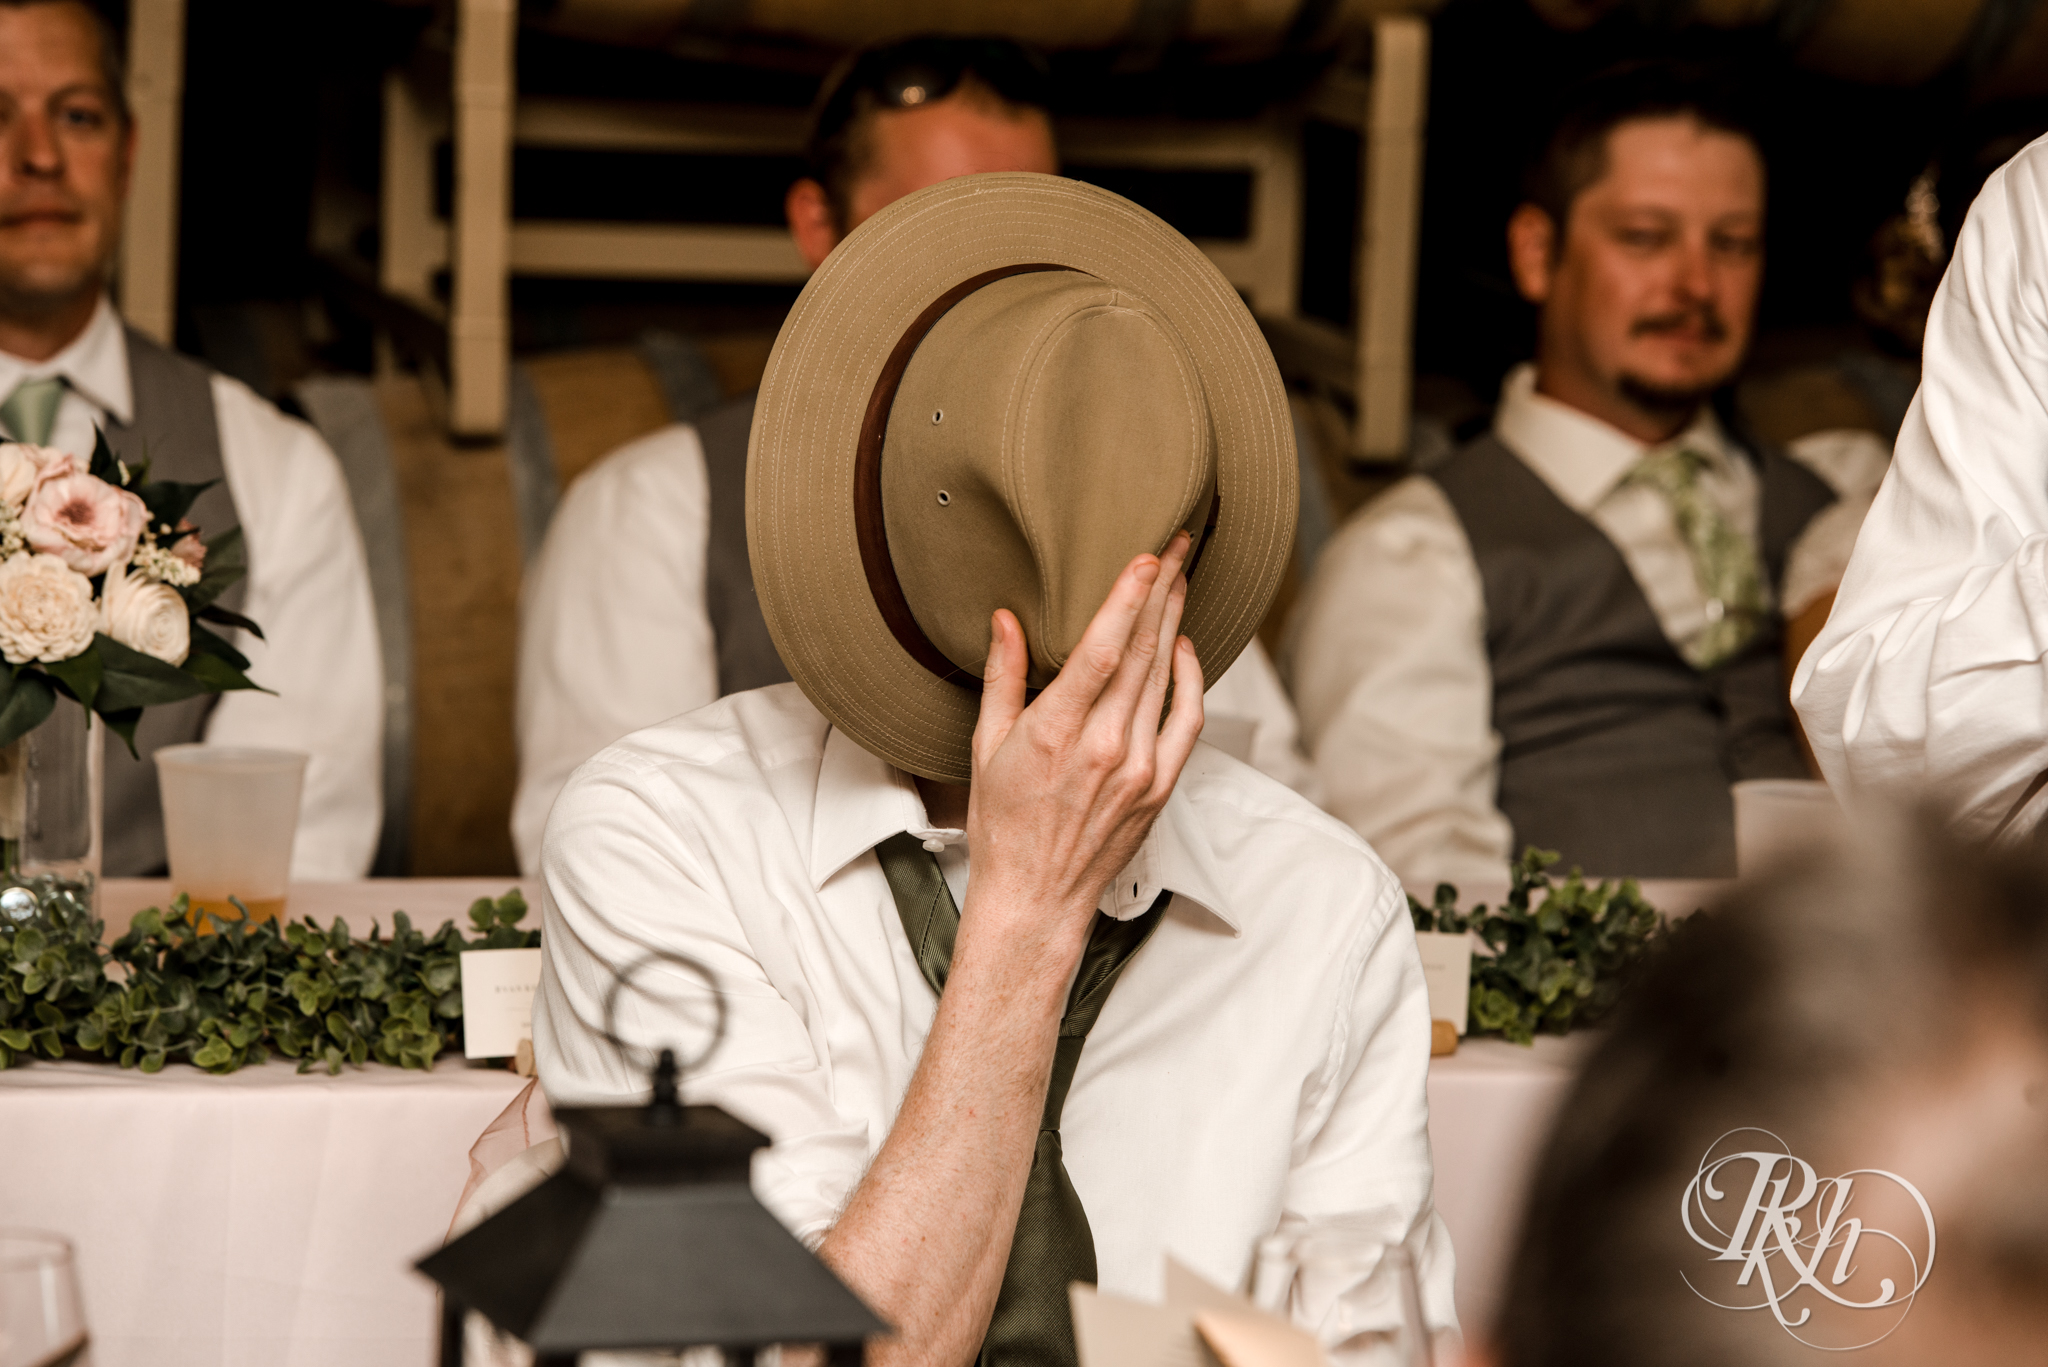 Ally & Nick - Minnesota Wedding Photography - Next Chapter Winery - RKH Images - Blog (38 of 57).jpg